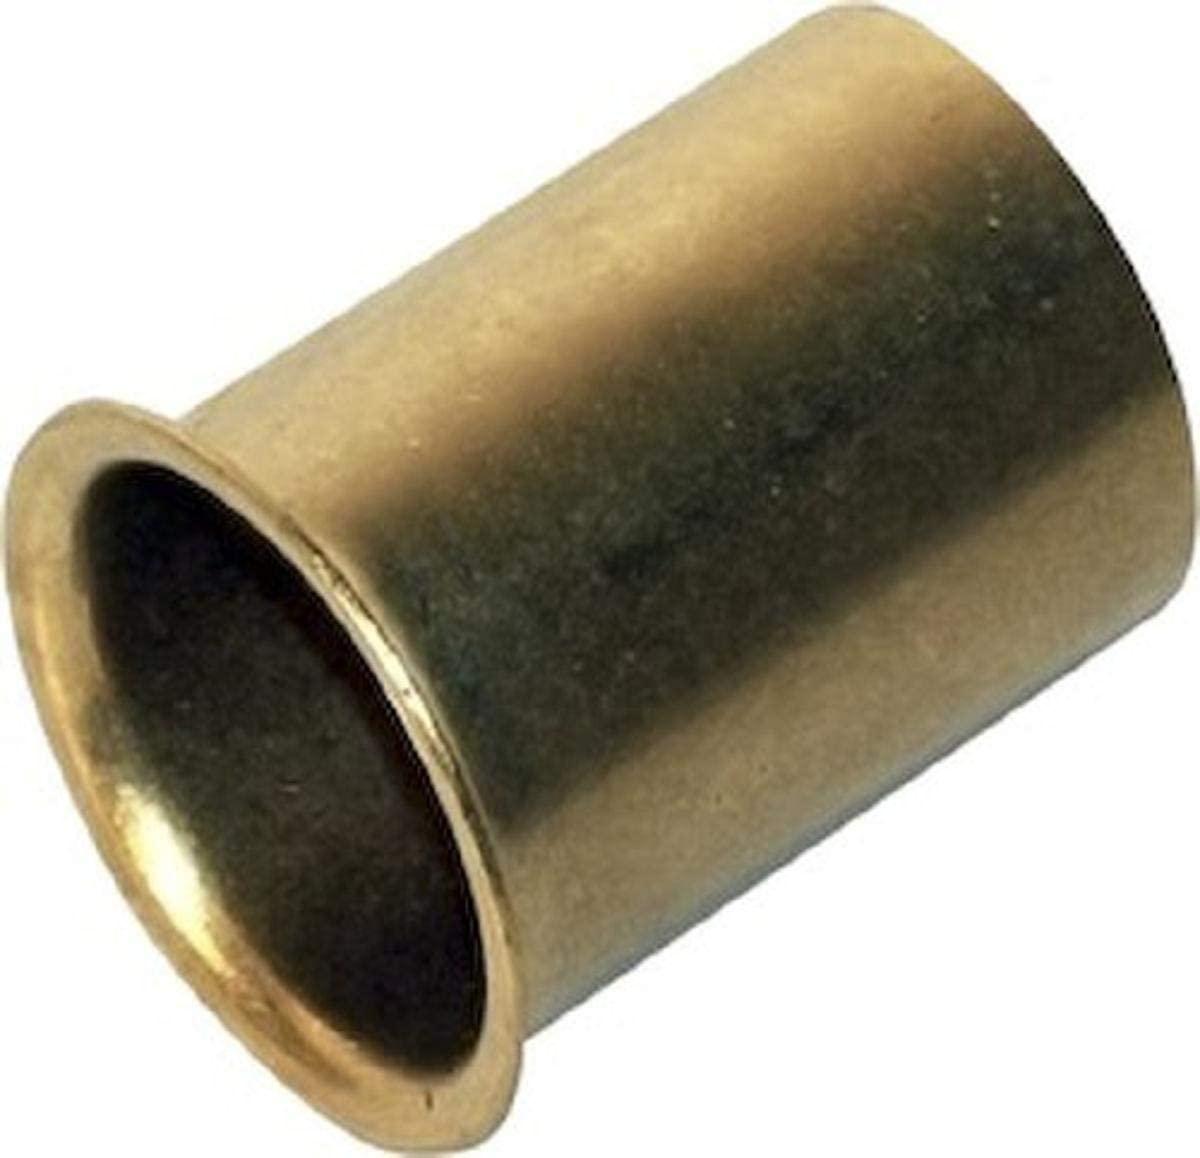 SeaSense Drain Tube Plug (1- Inch, Length -1-7/8 Inch)